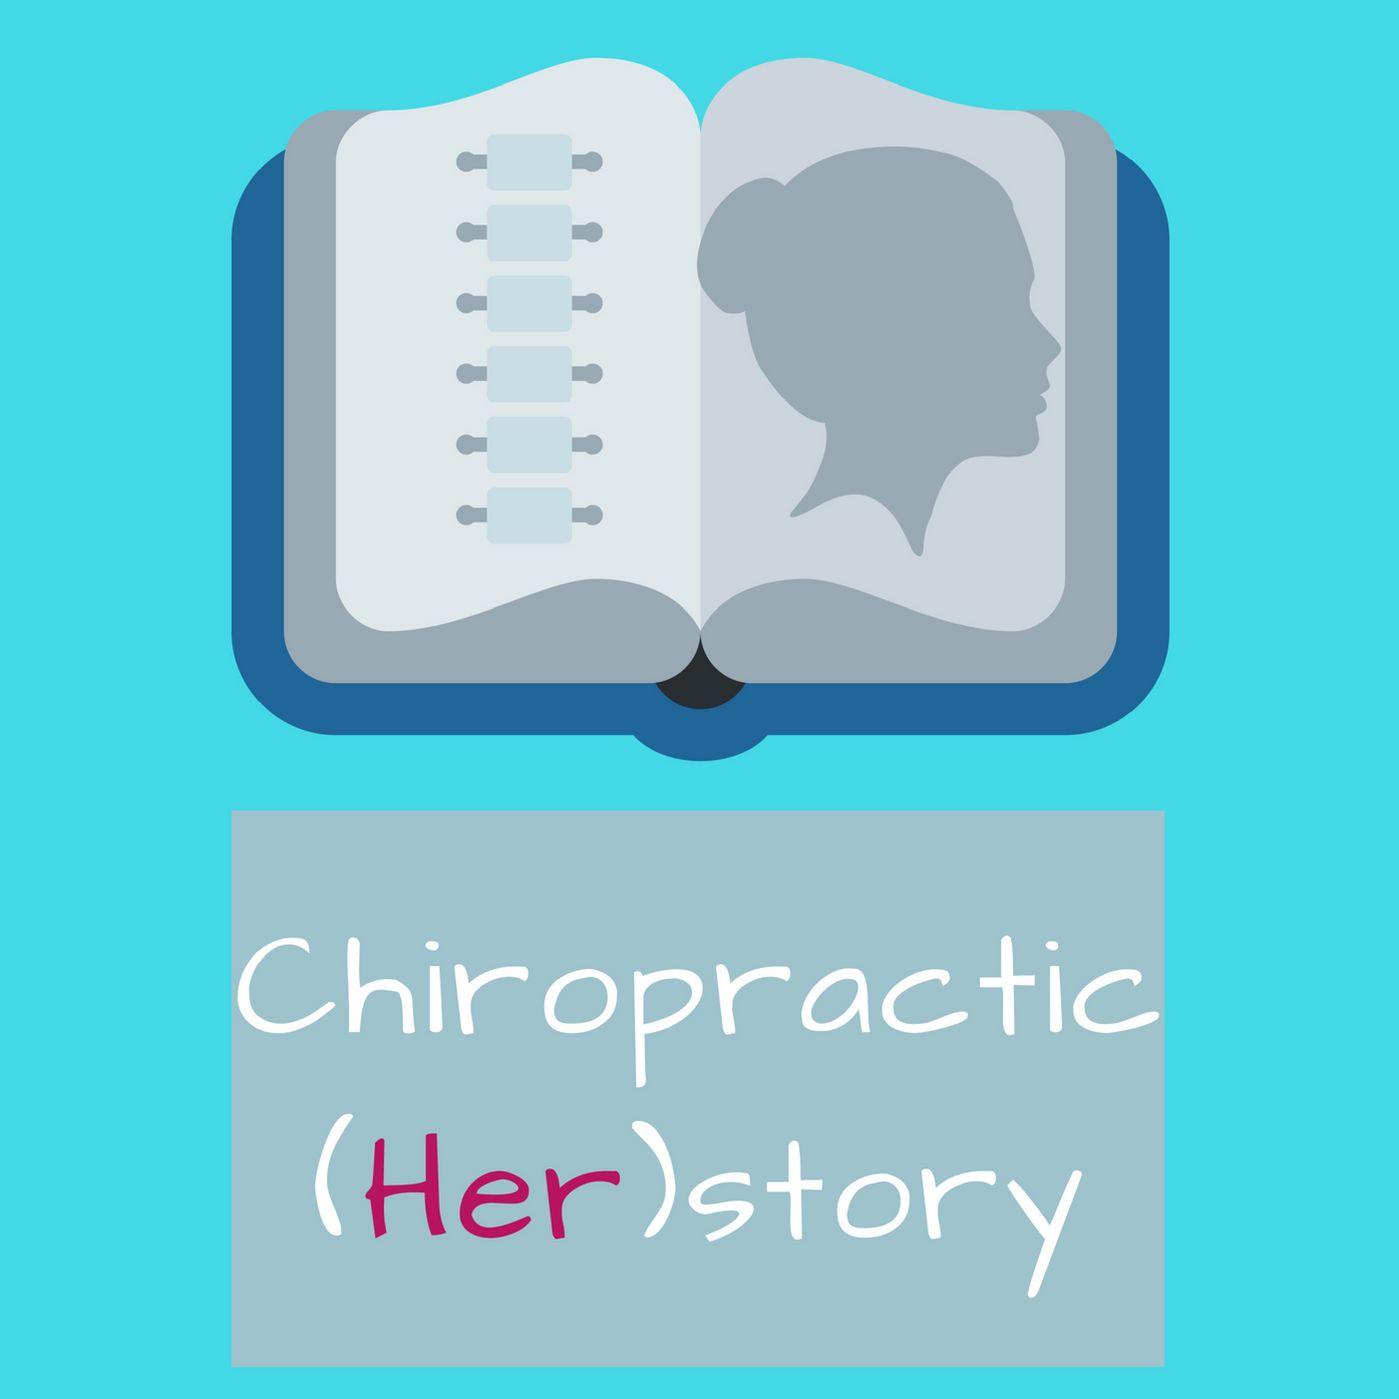 Dr. Nichelle Gurule- Chiropractic (Her)story Episode 49